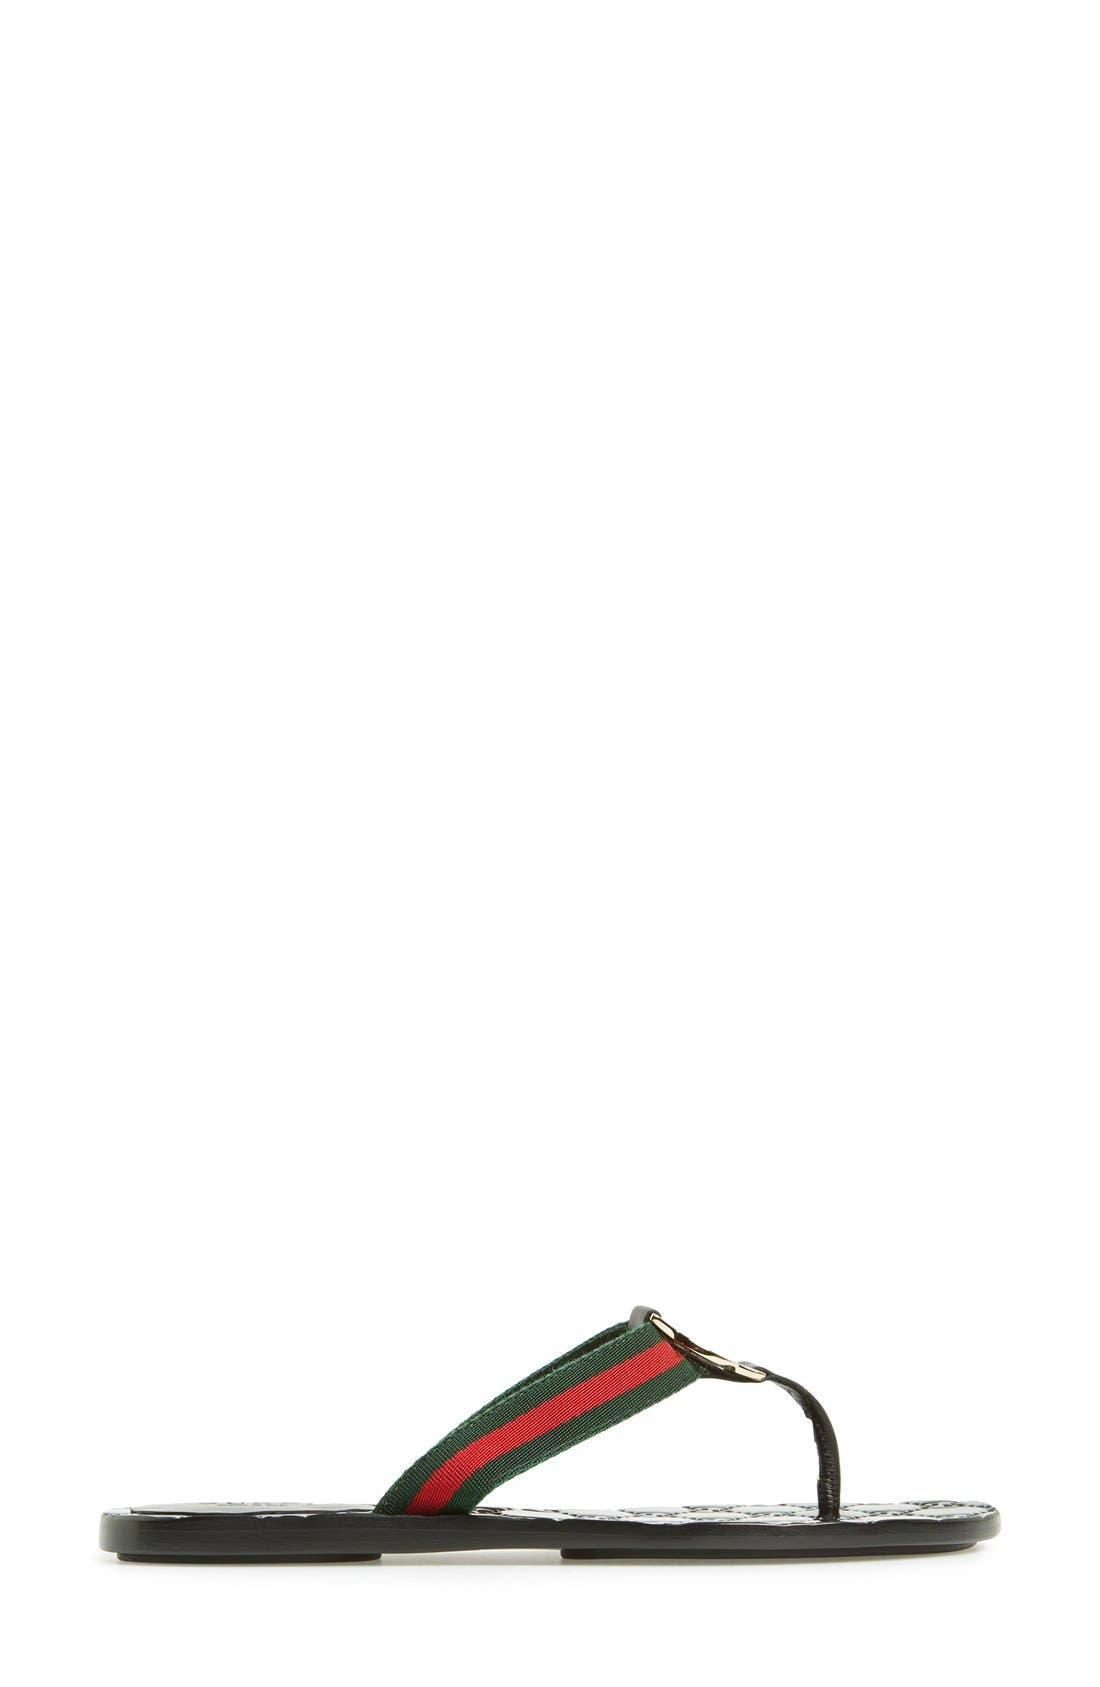 GUCCI,                             'GG' Logo Sandal,                             Alternate thumbnail 4, color,                             NERO